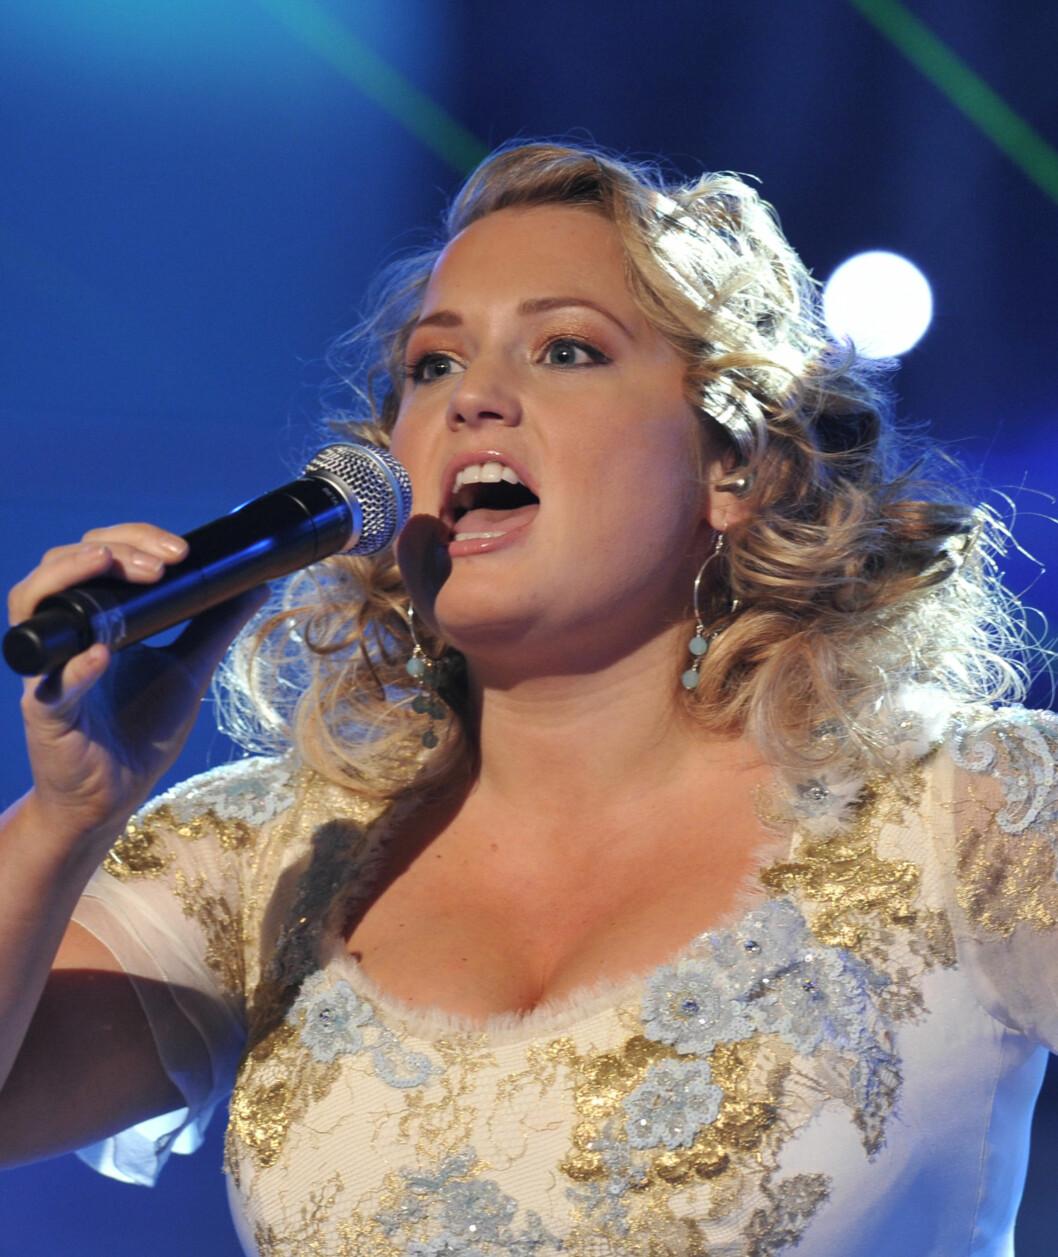 <strong>HVIT ELEGANSE:</strong> Helene Bøksle sang hjerteskjærende vakkert, og sikret seg en plass i MGP-finalen i februar.  Foto: Scanpix